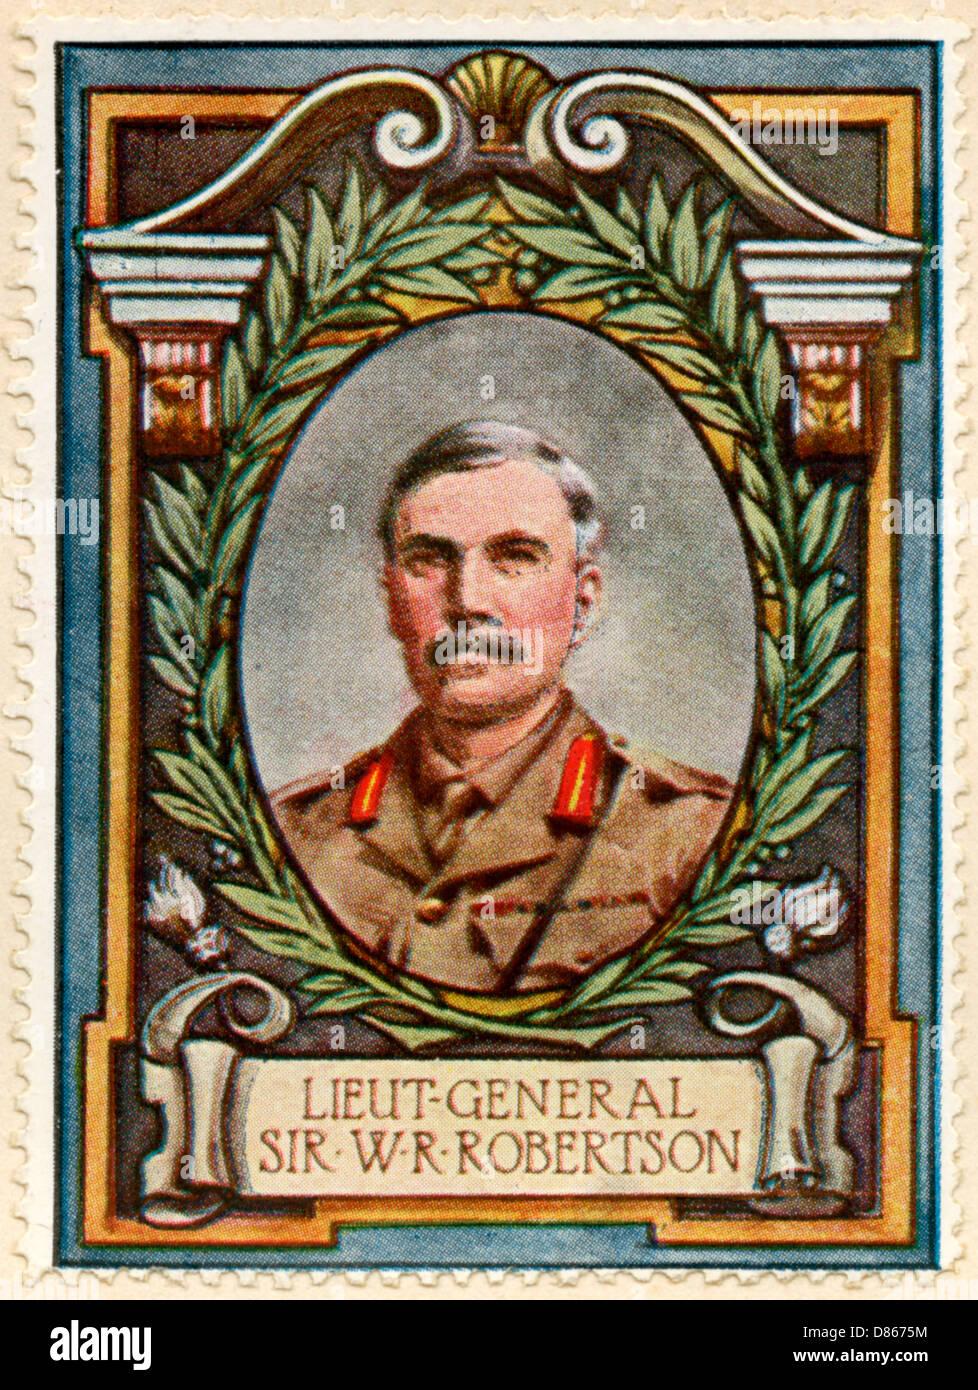 Field Marshal Sir Robertson Stamp Stock Photo